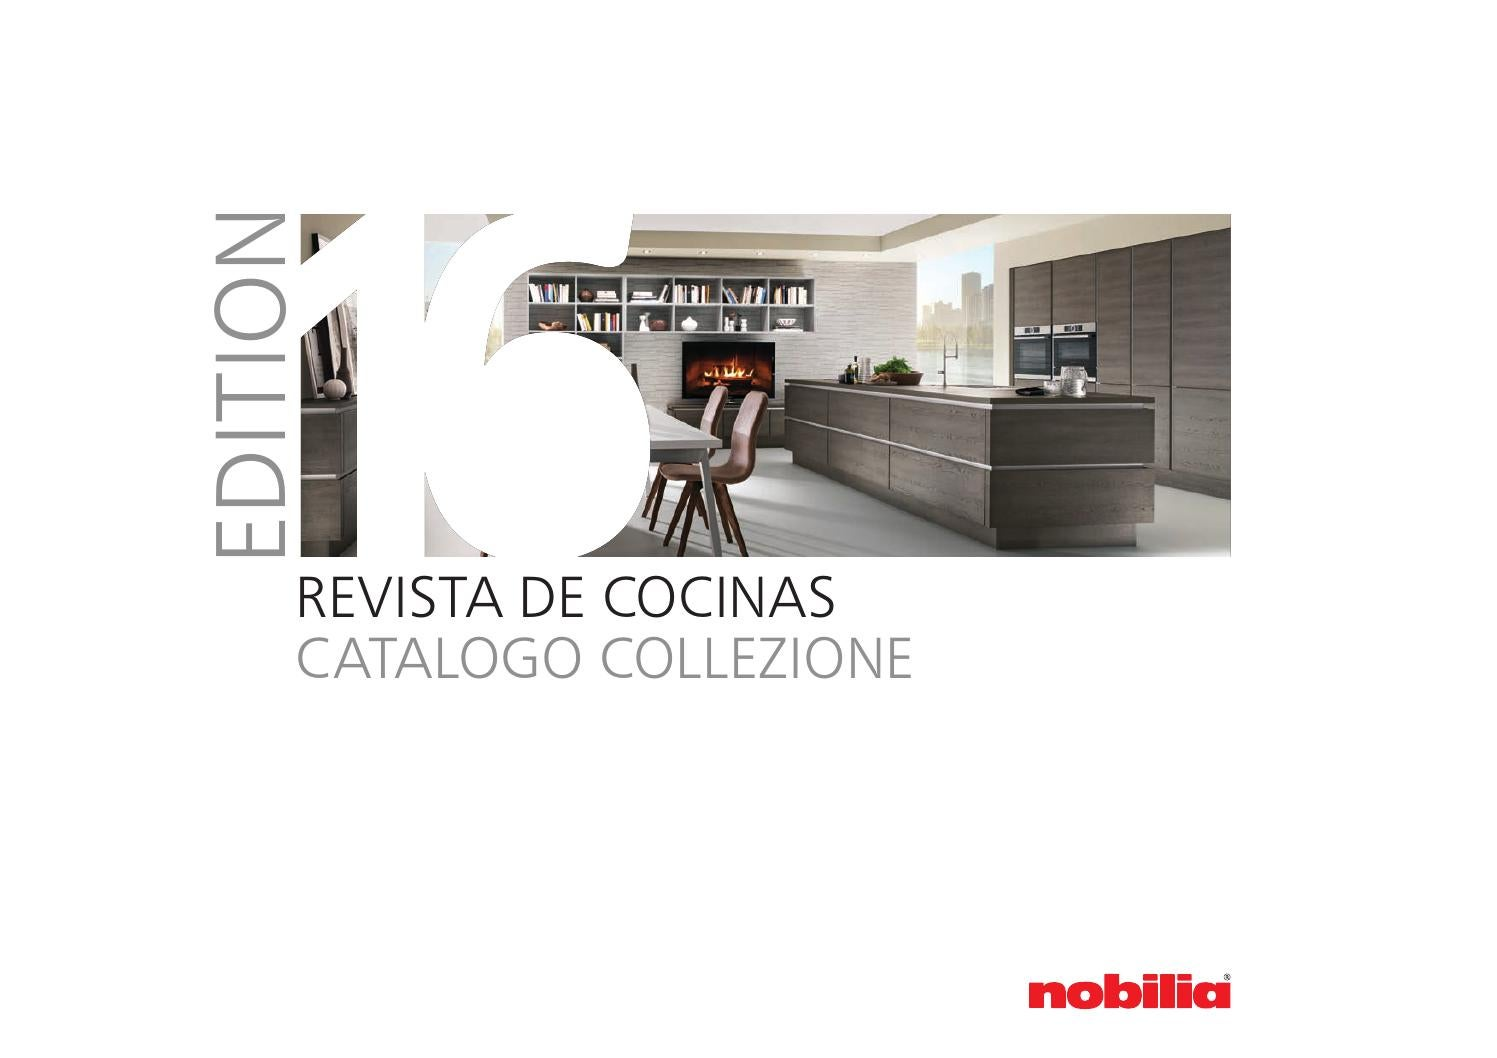 gm cucine prezzi - 28 images - emejing gm cucine prezzi gallery ...